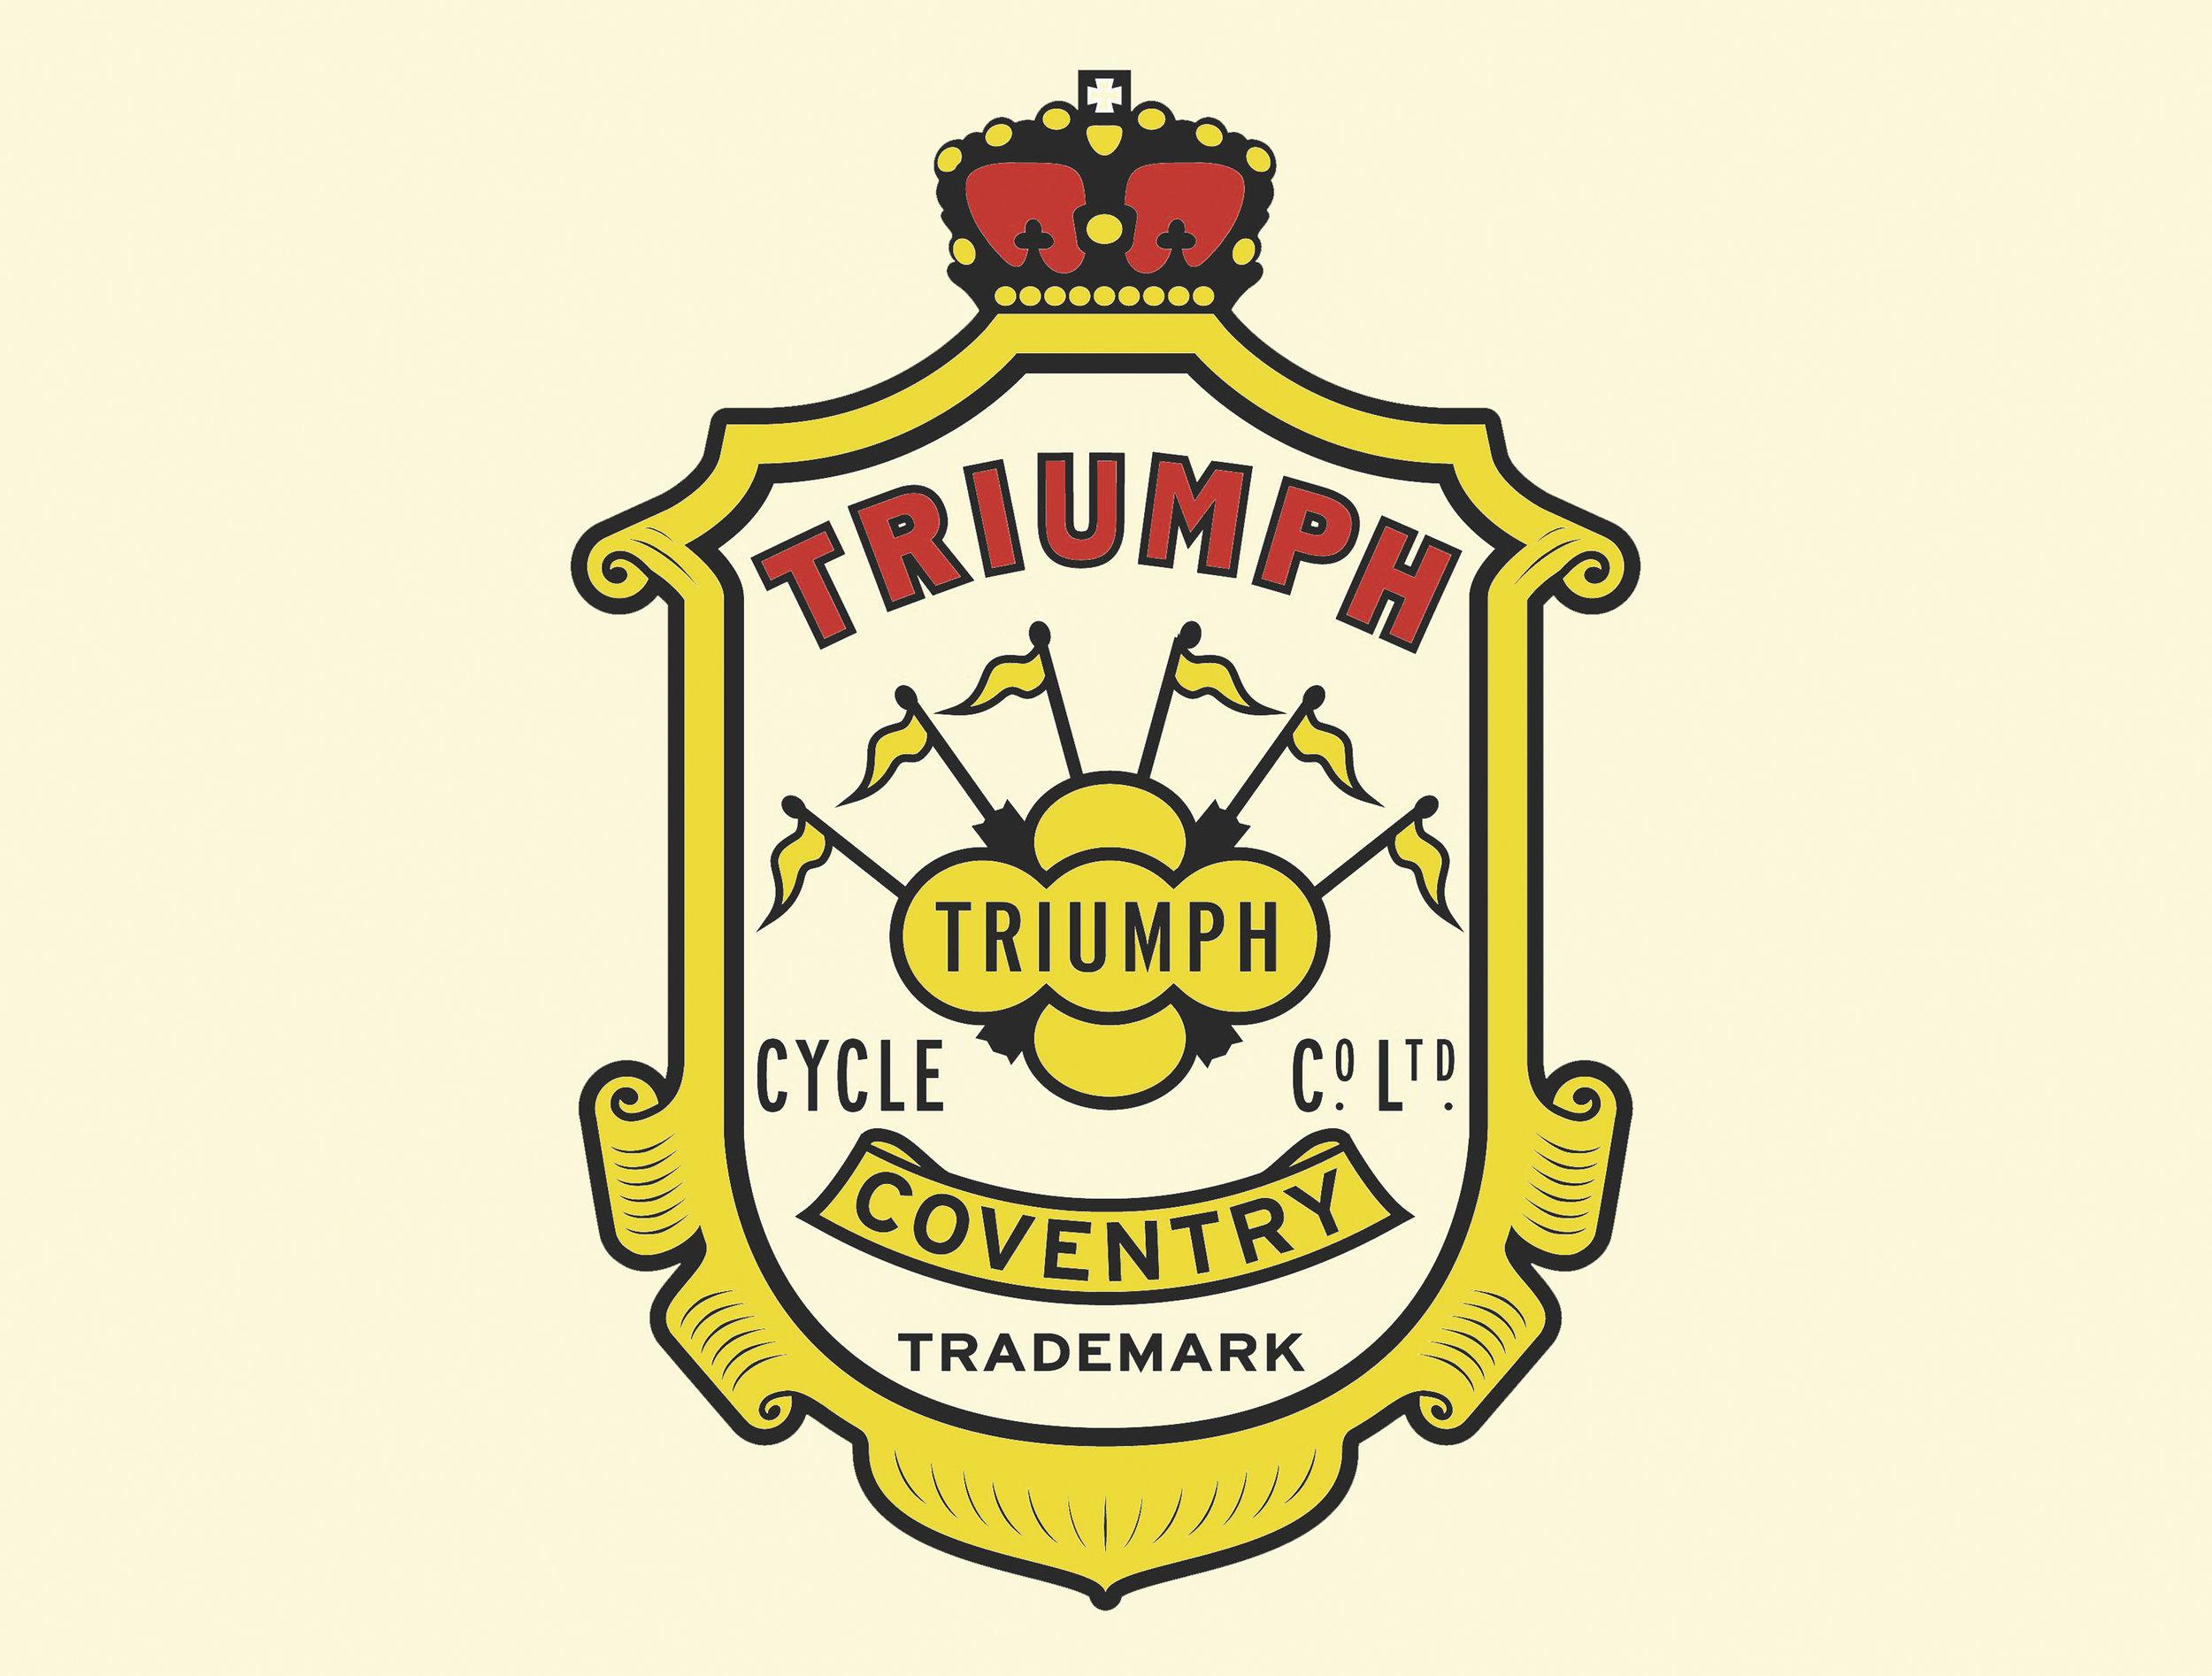 The very regal 1920s Triumph logo.